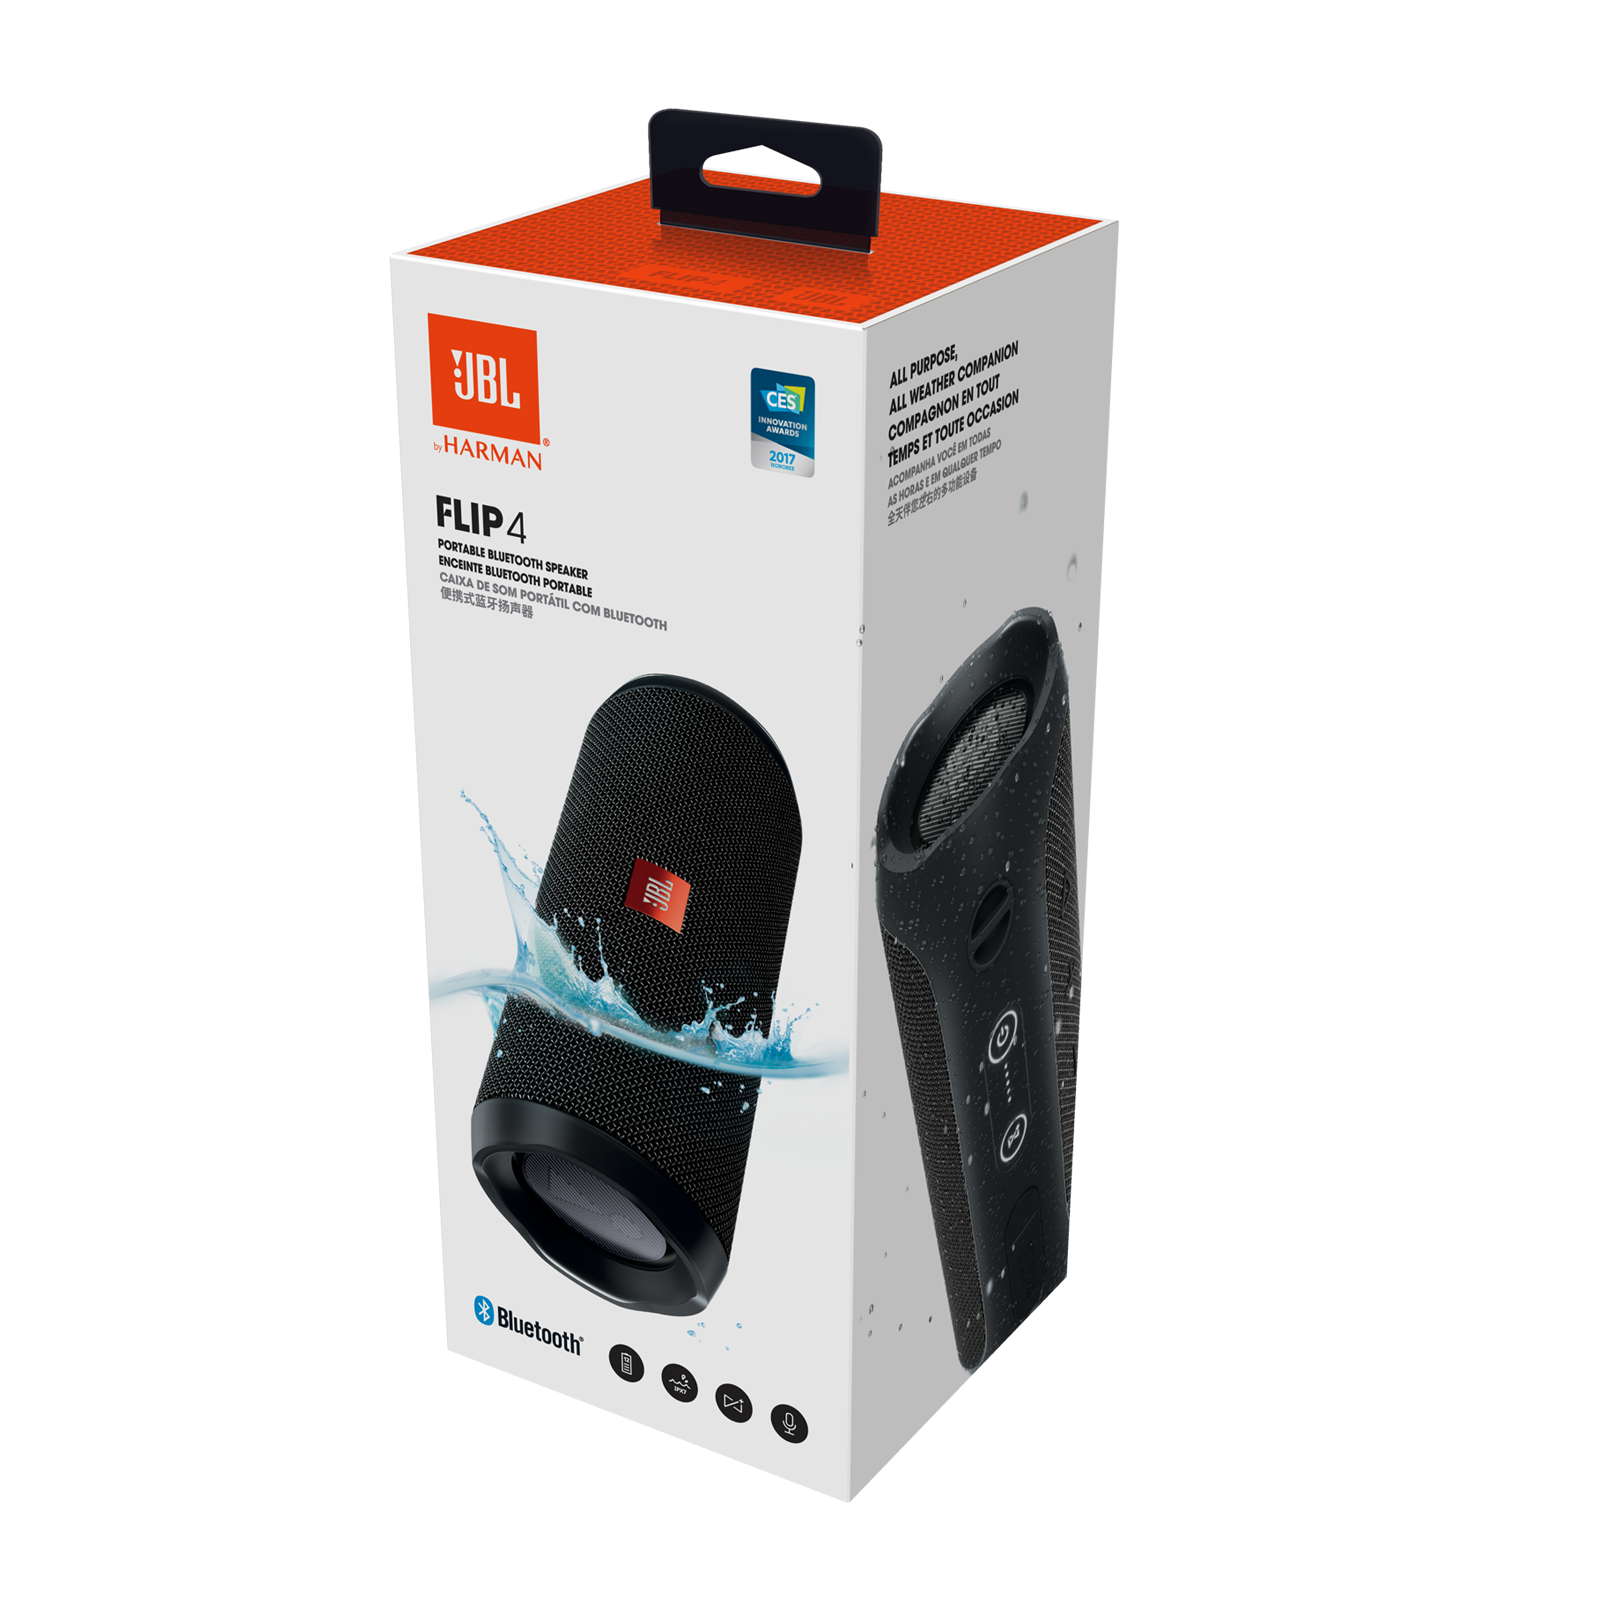 Jbl Flip 4 Tragbarer Bluetooth Lautsprecher